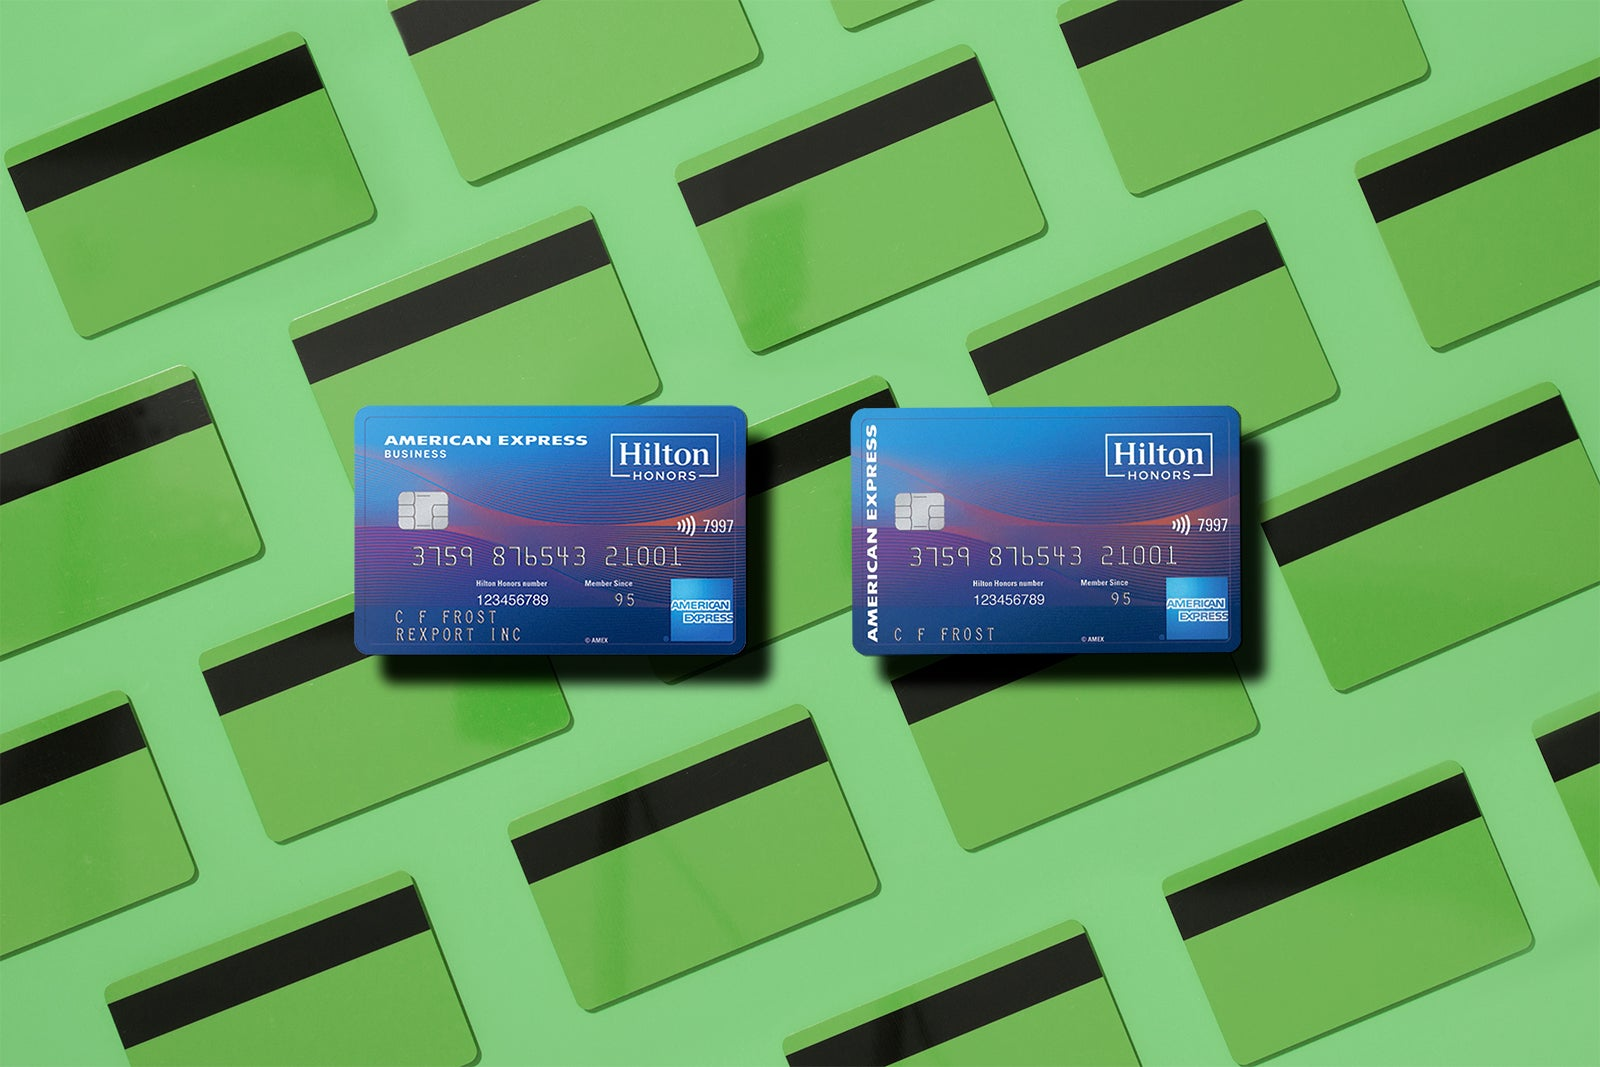 Stamp bonus card stamp \u00abPFENNIG\u00bb 10 x 10 mm motif money card bonus card bonus card customer point collector saving money happiness nostalgia